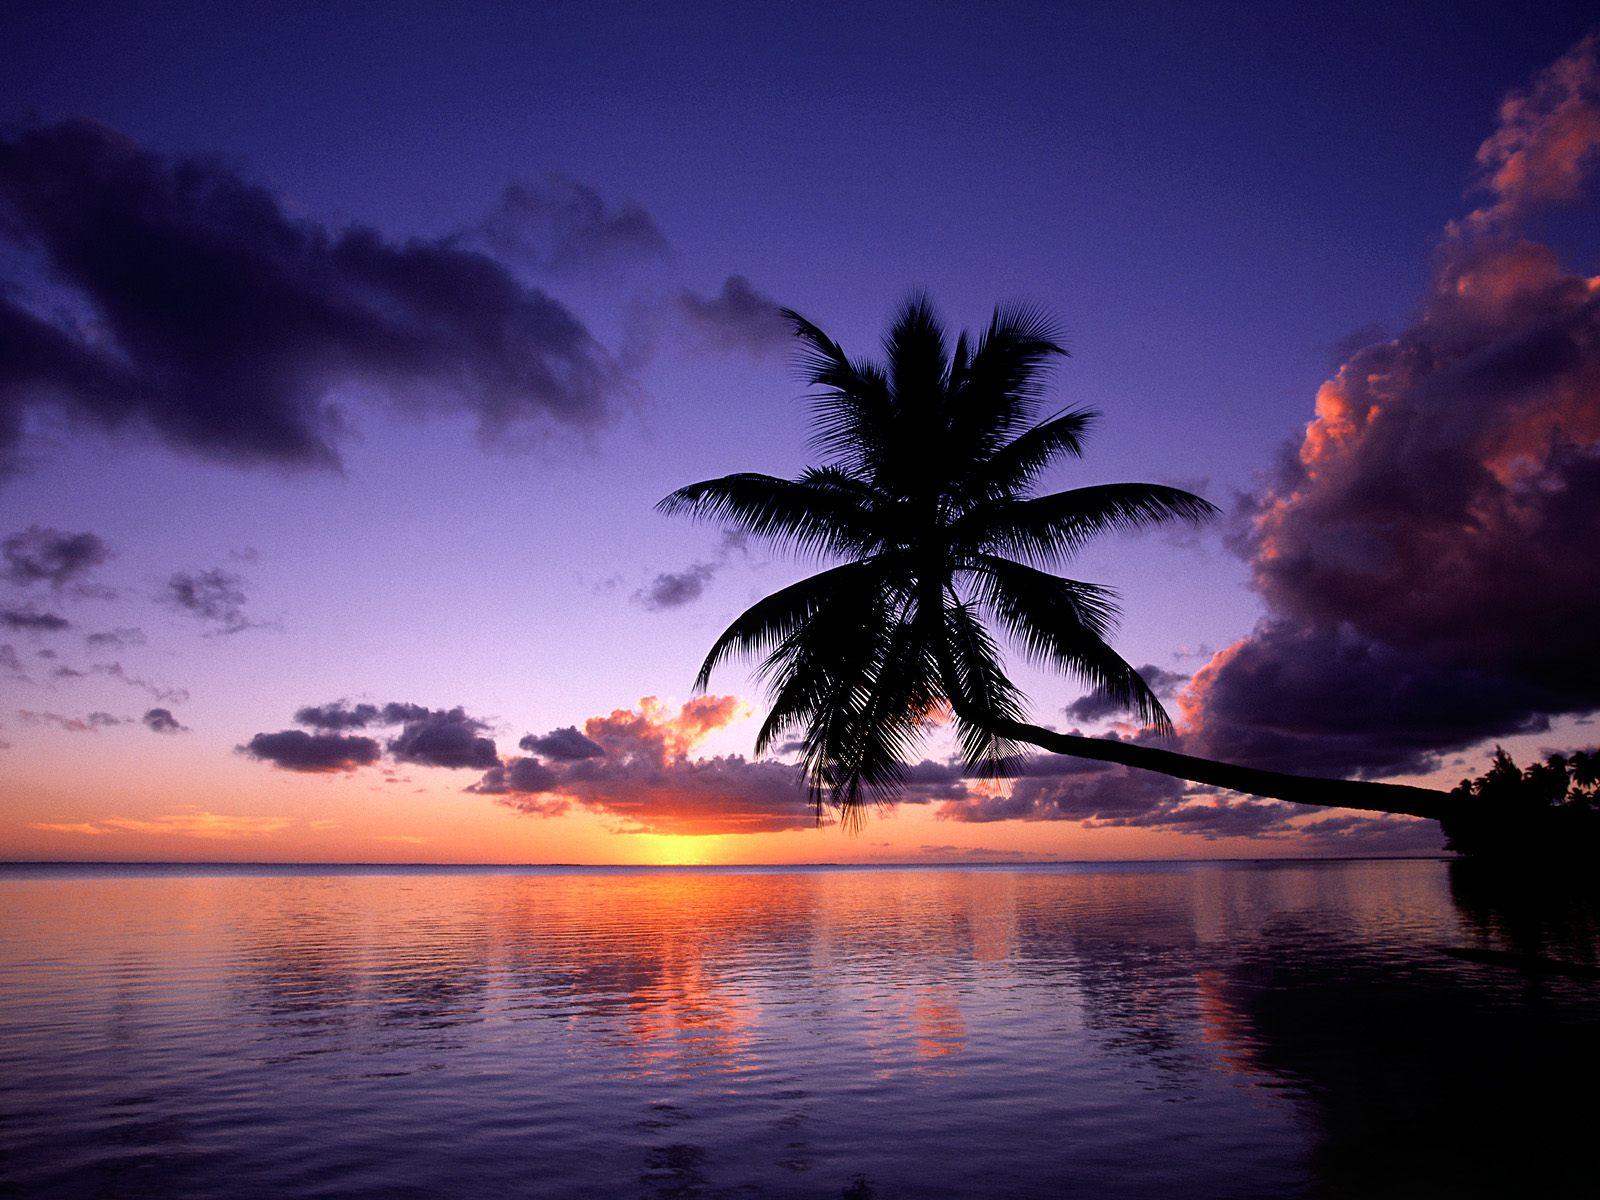 download 1600x1200 tropical island beach scenery sunset wallpaper